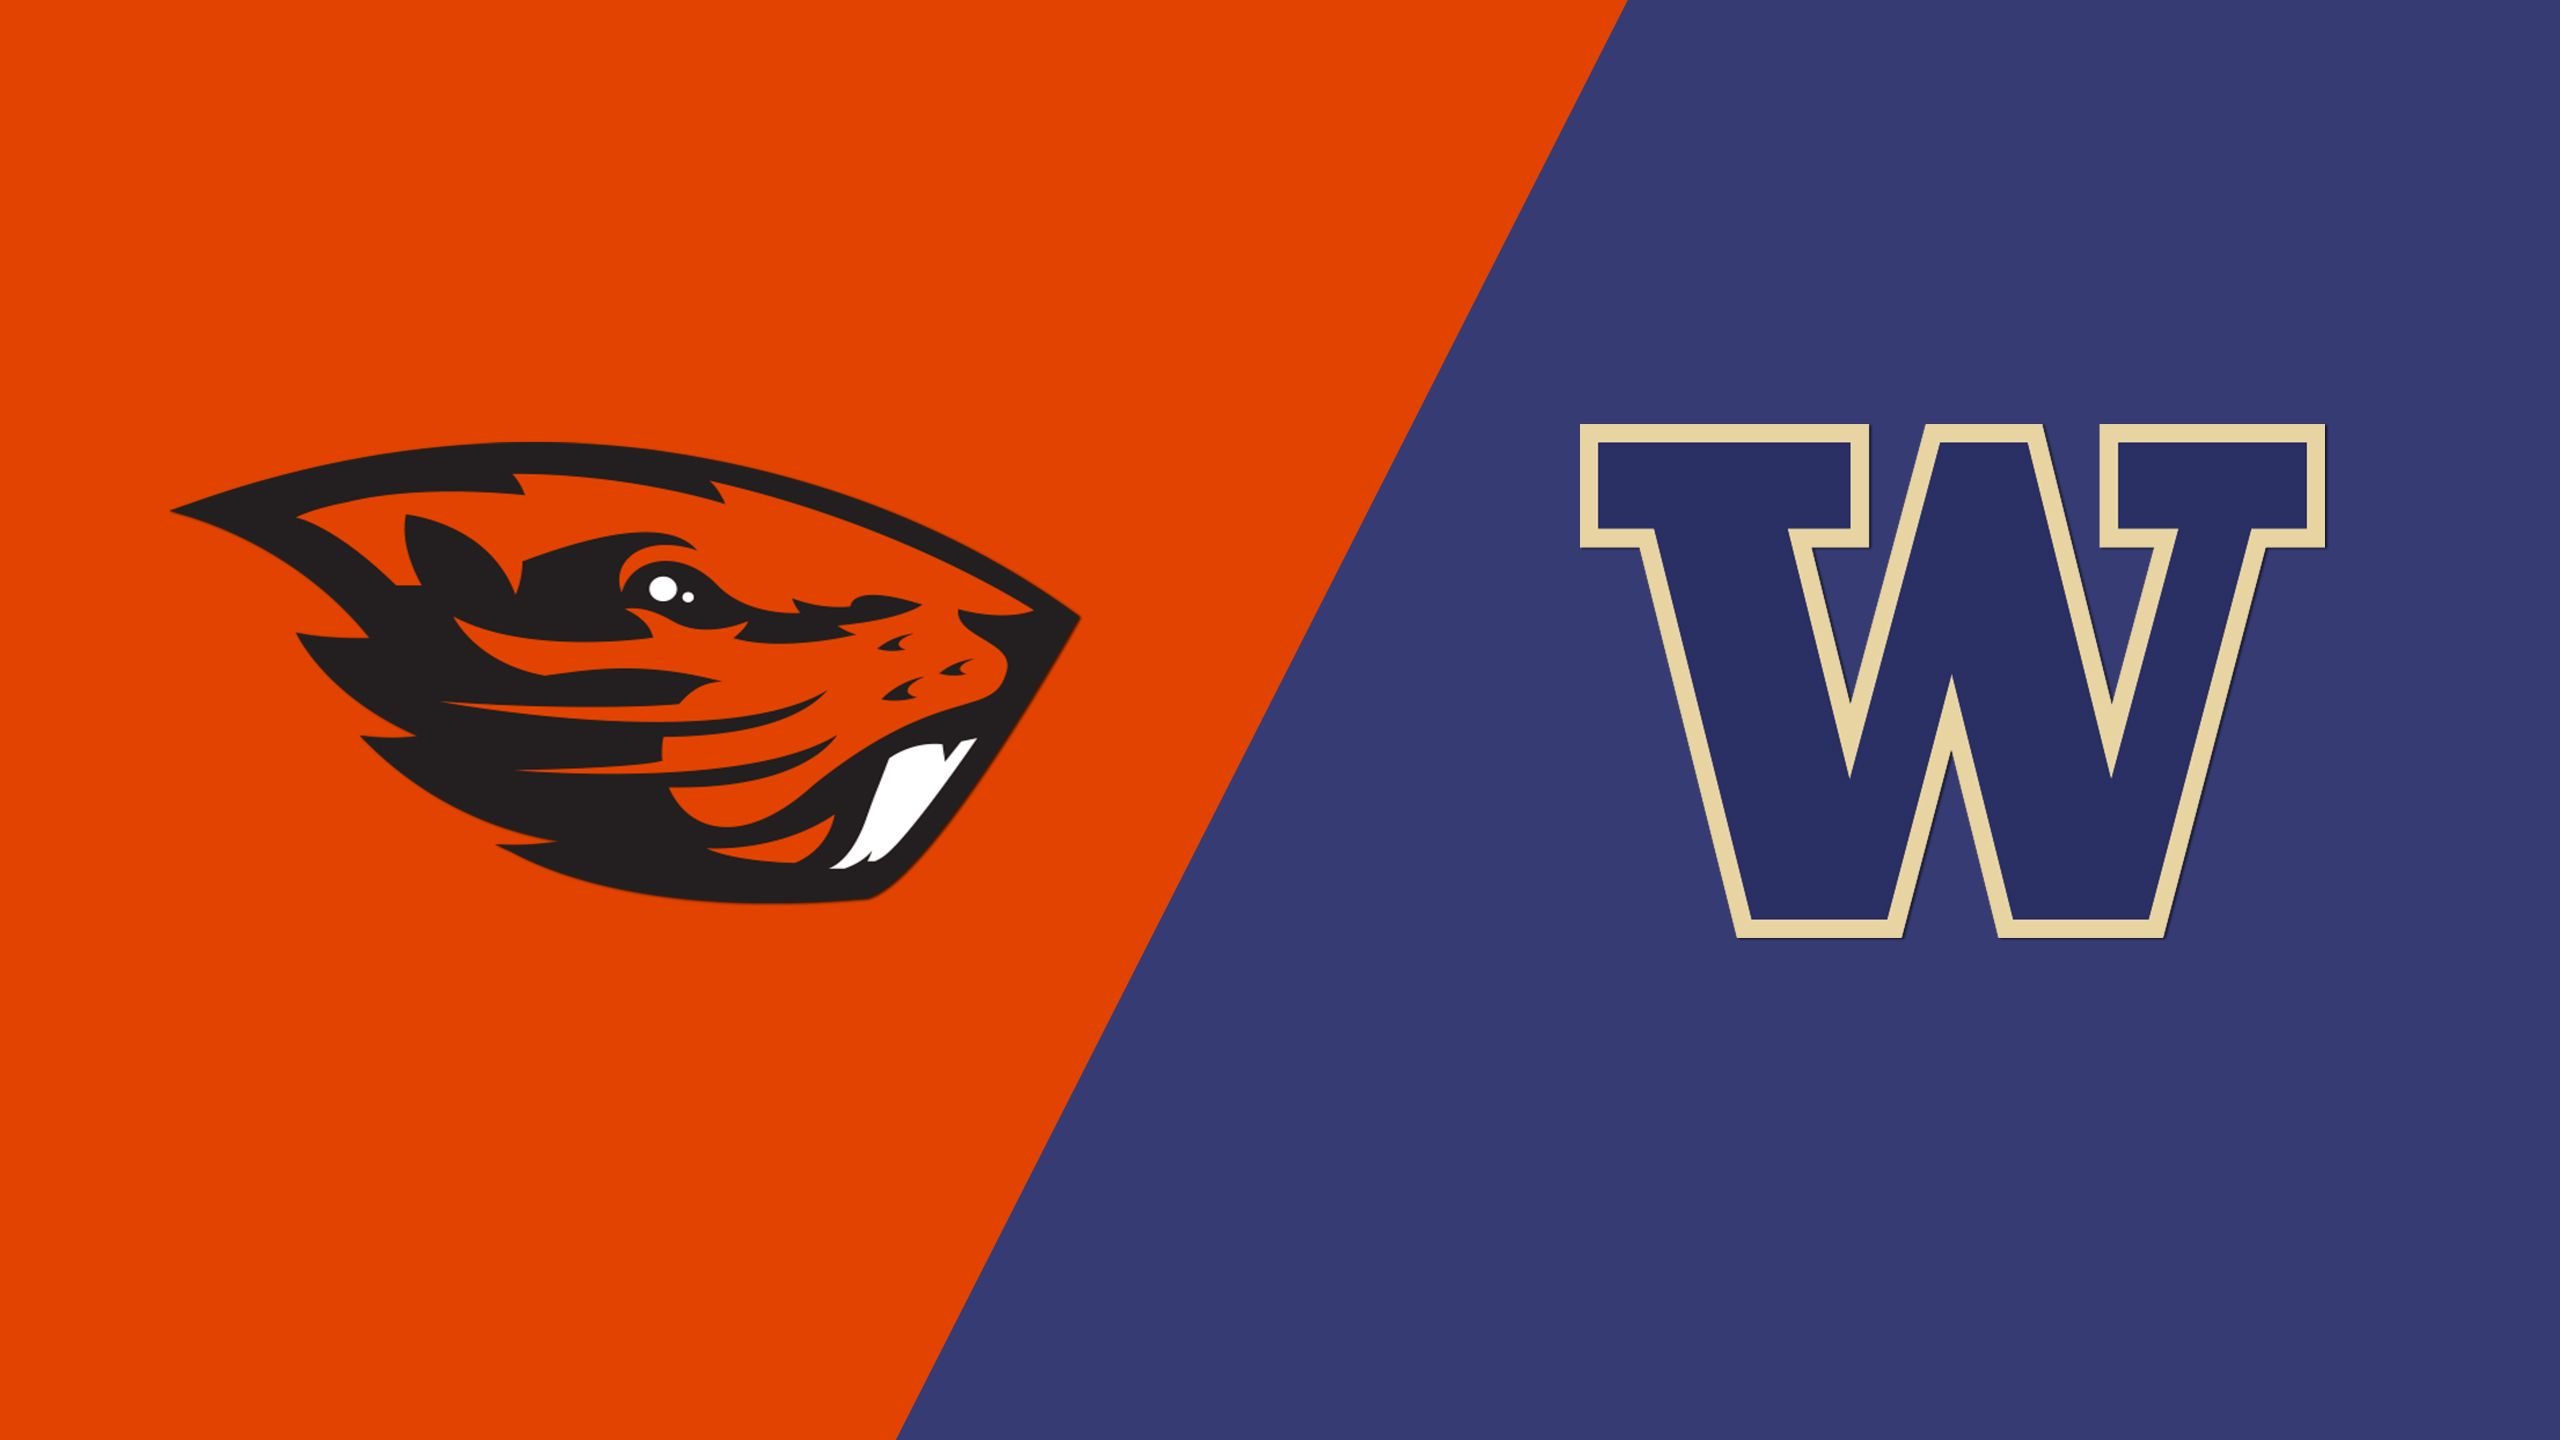 Oregon State vs. Washington (Game 5)